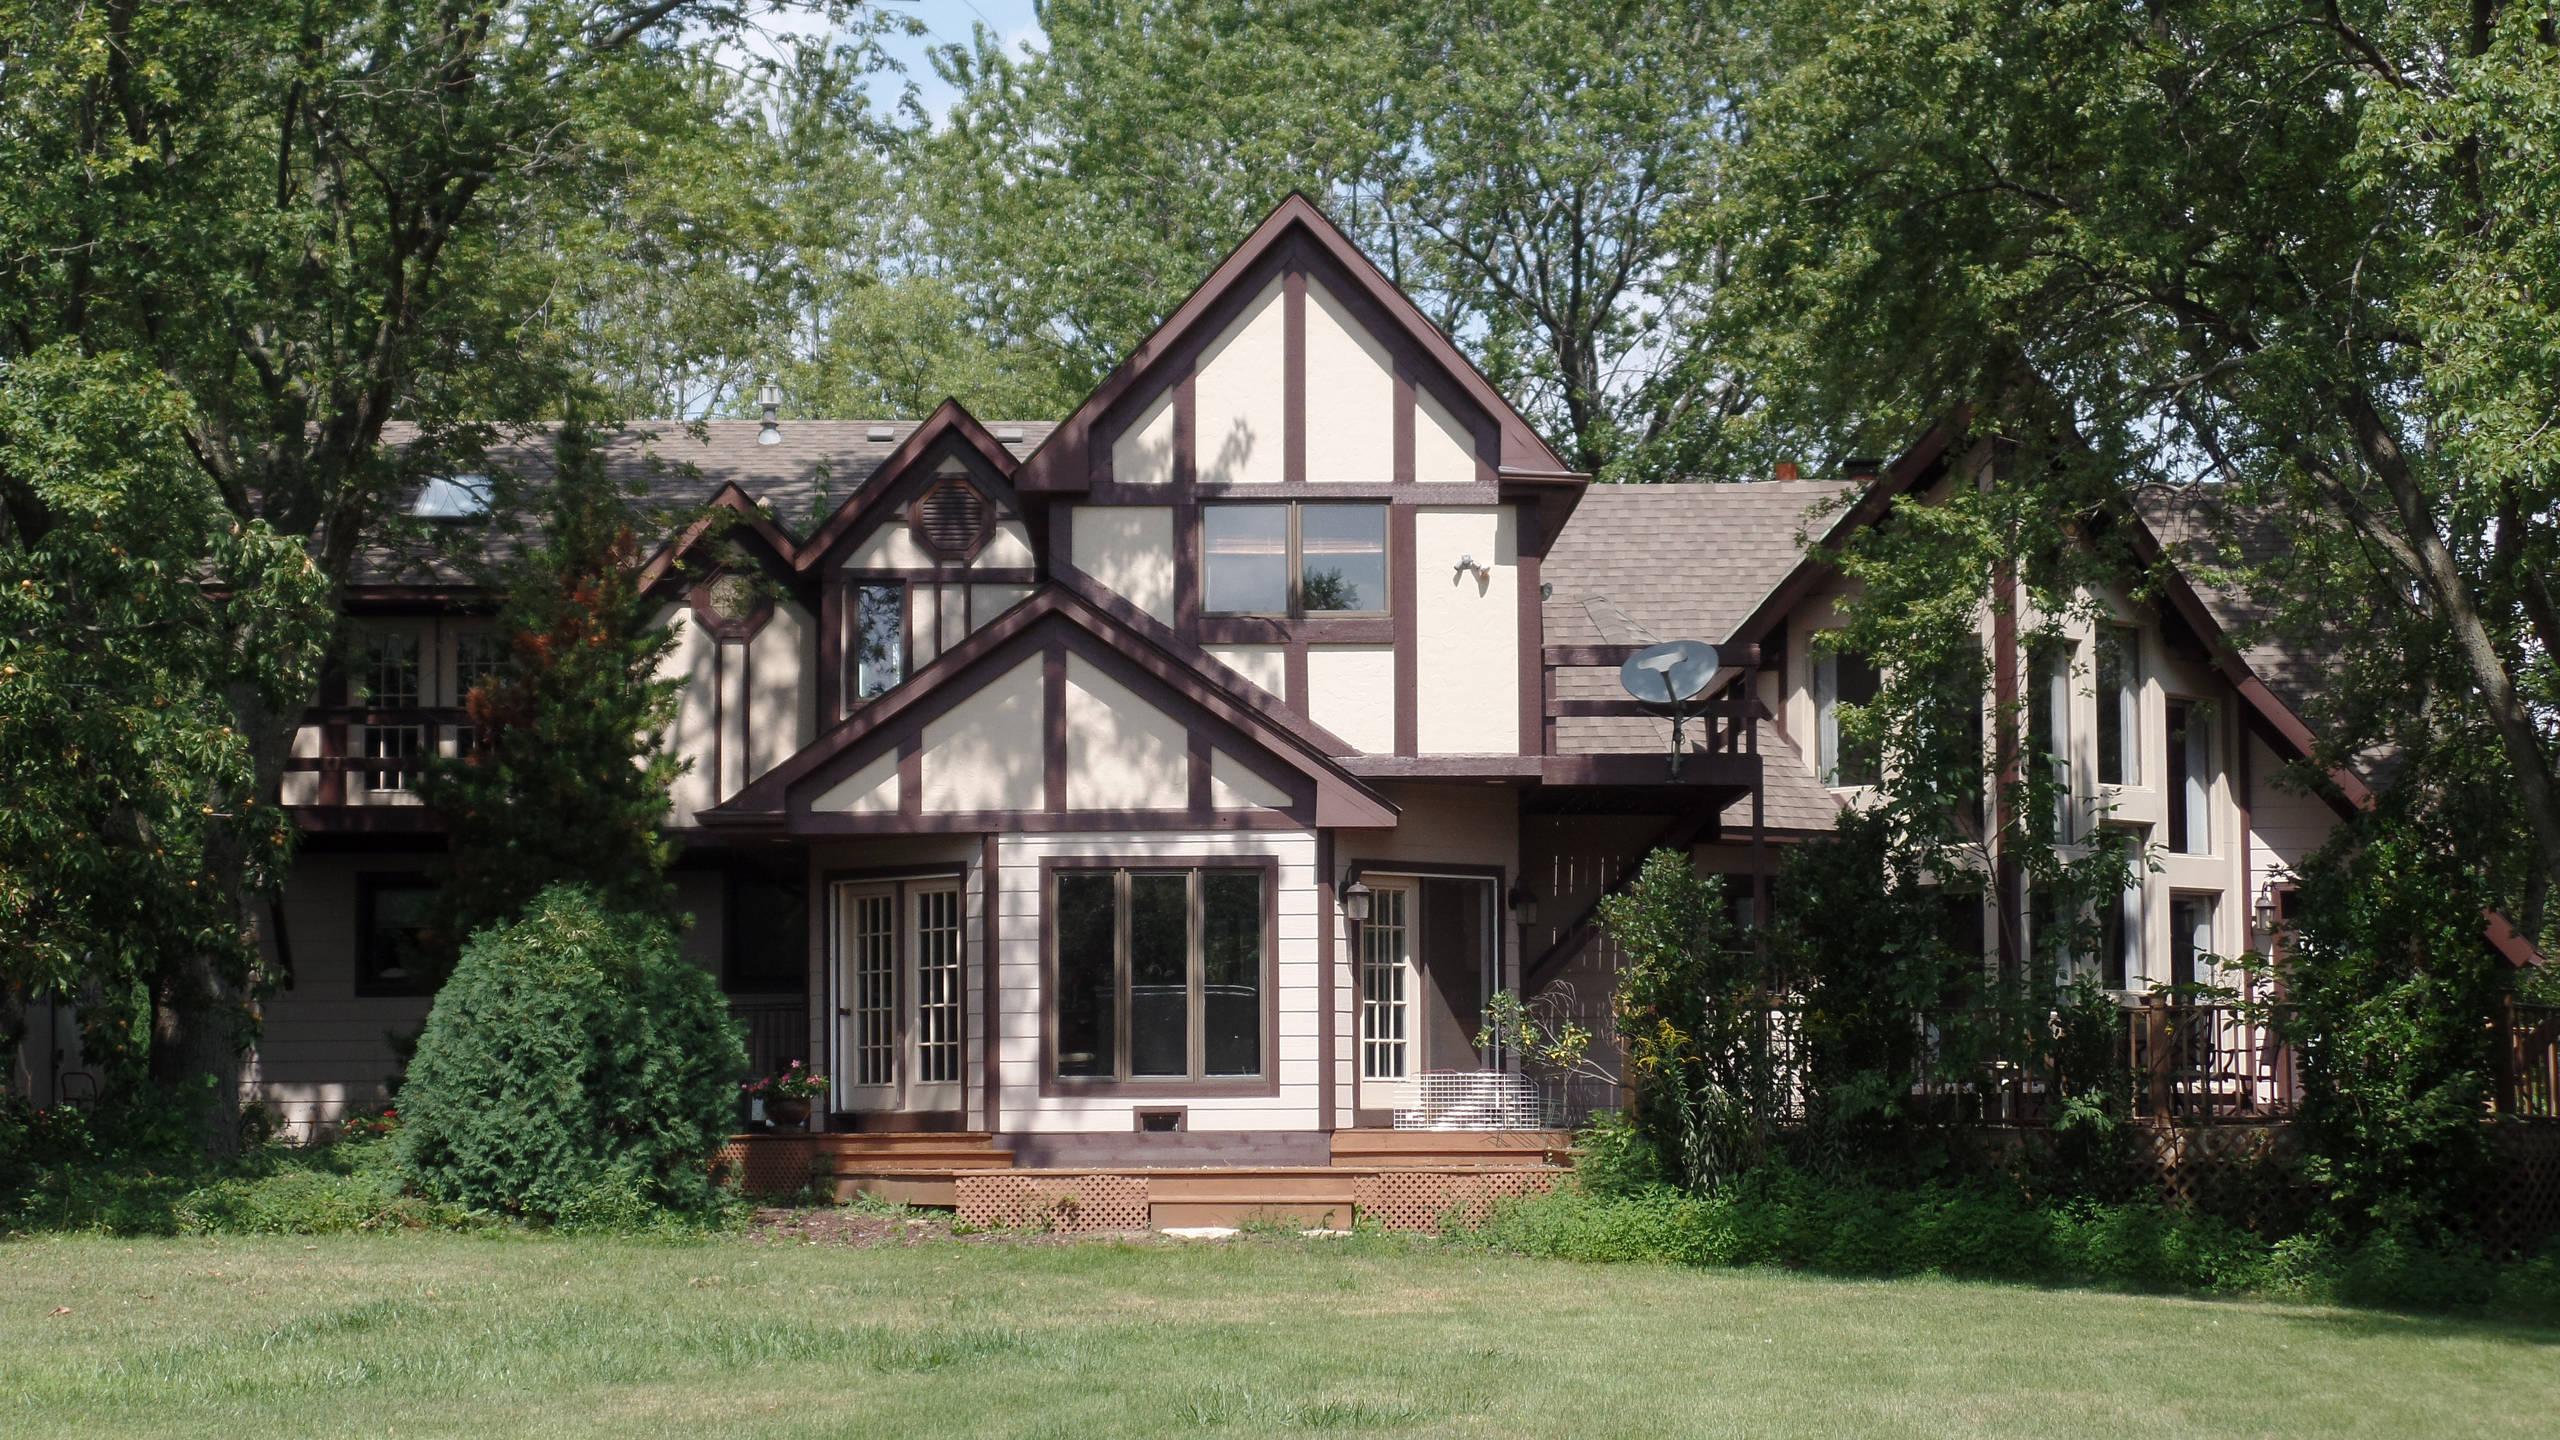 Modern Farmhouse Homestead - BEFORE